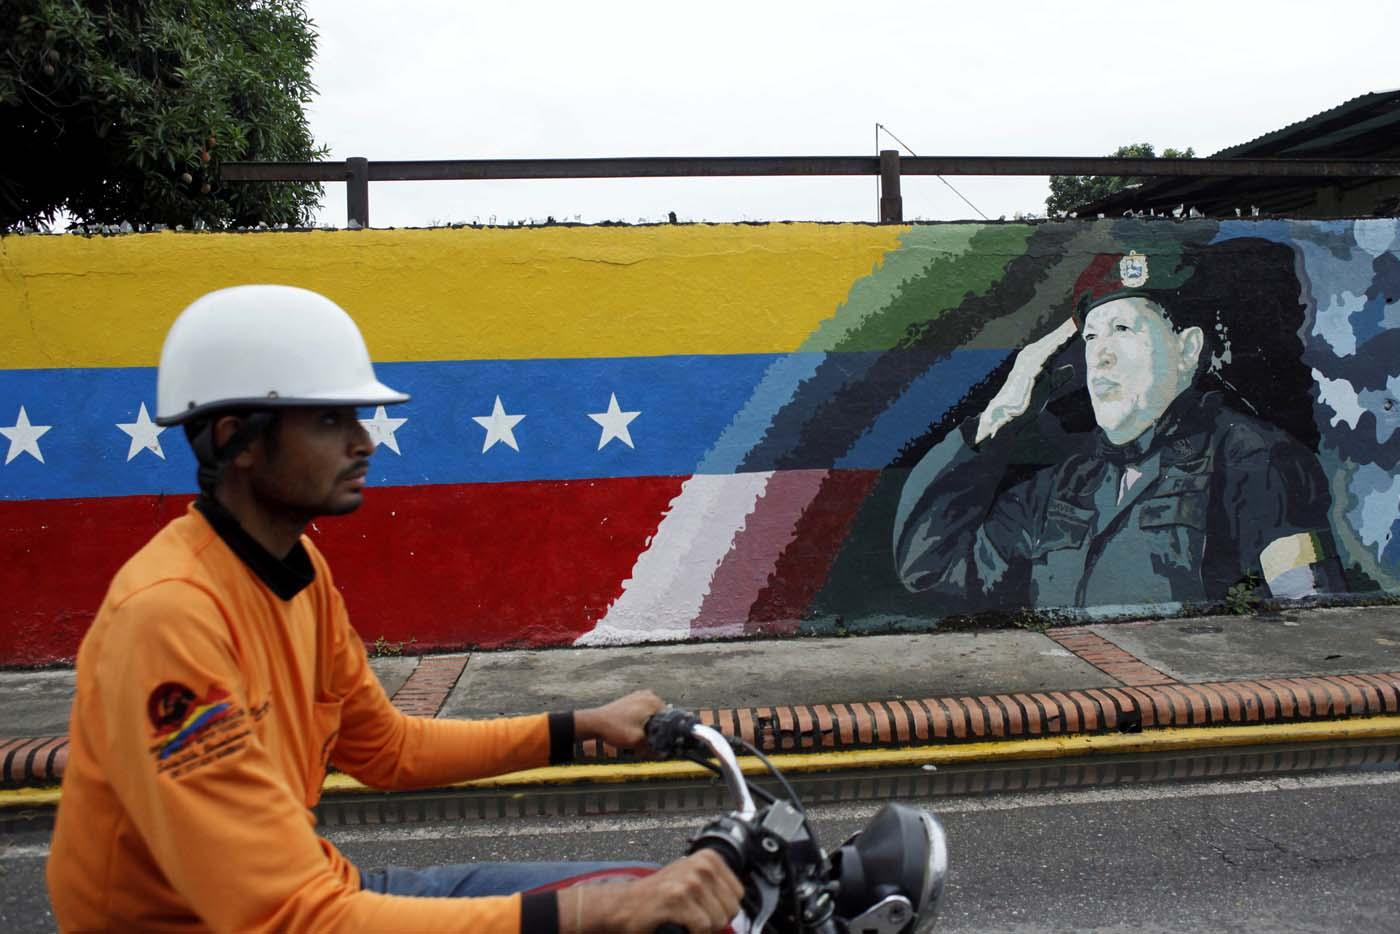 A motorcyclist rides past a mural depicting Venezuela's late President Hugo Chavez in Sabaneta, Venezuela June 13, 2017. Picture taken June 13, 2017. REUTERS/Carlos Eduardo Ramirez